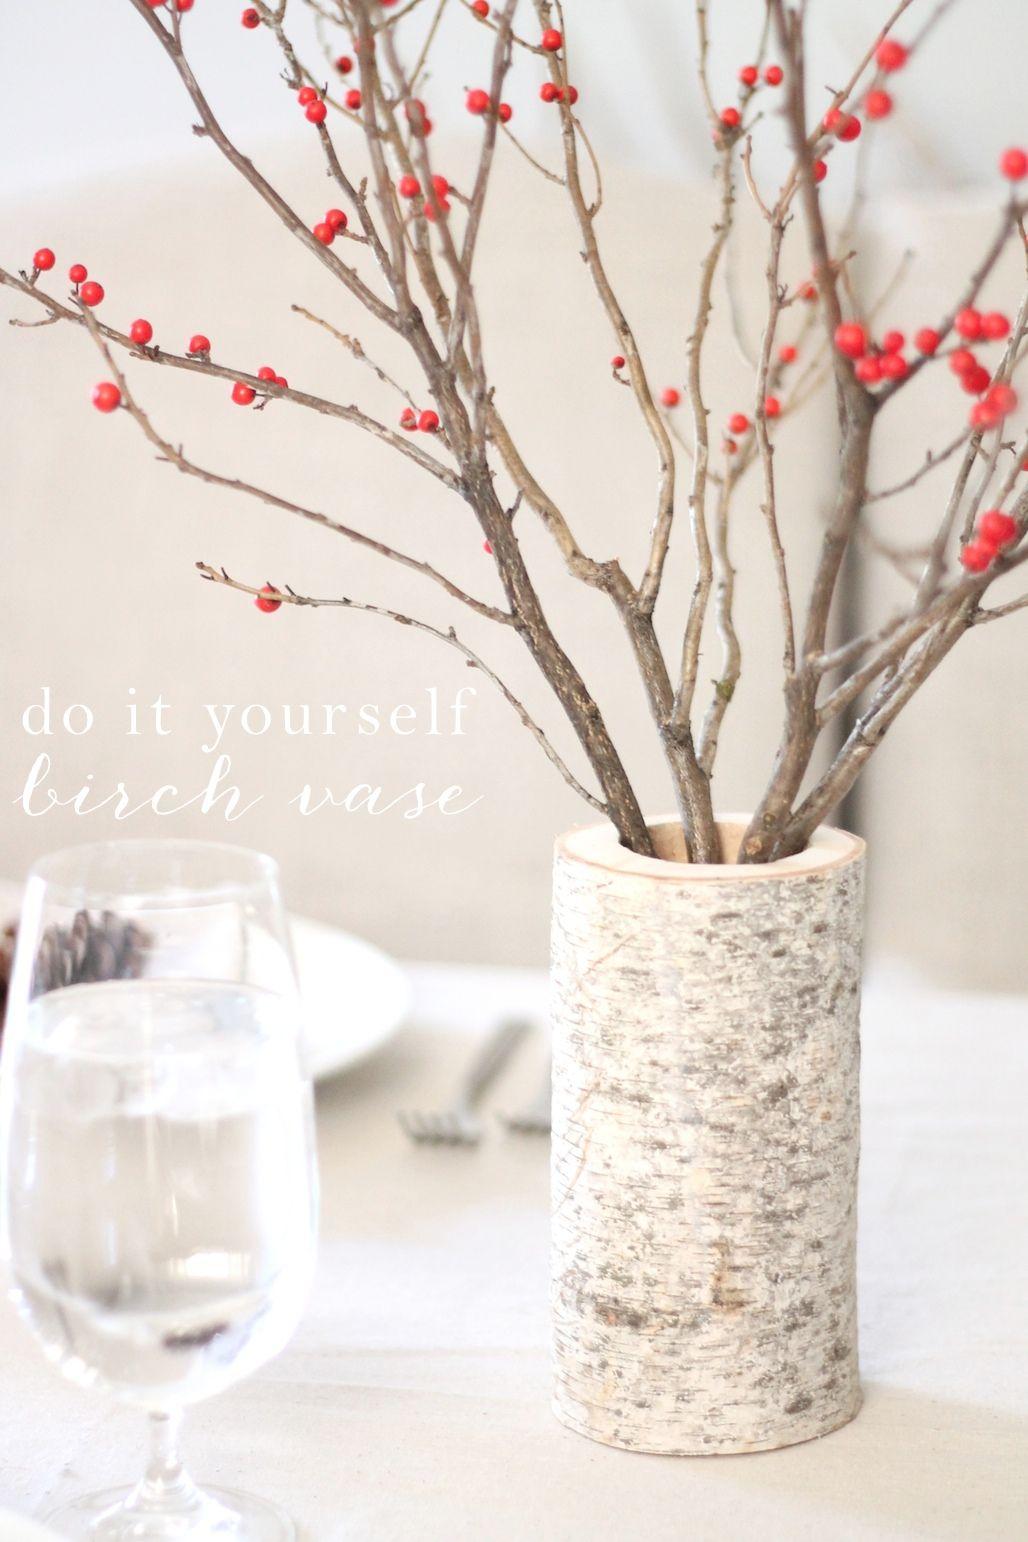 Diy Birch Vase Easy Holiday Centerpiece Holiday Centerpieces Christmas Decorations Rustic Birch Tree Decor